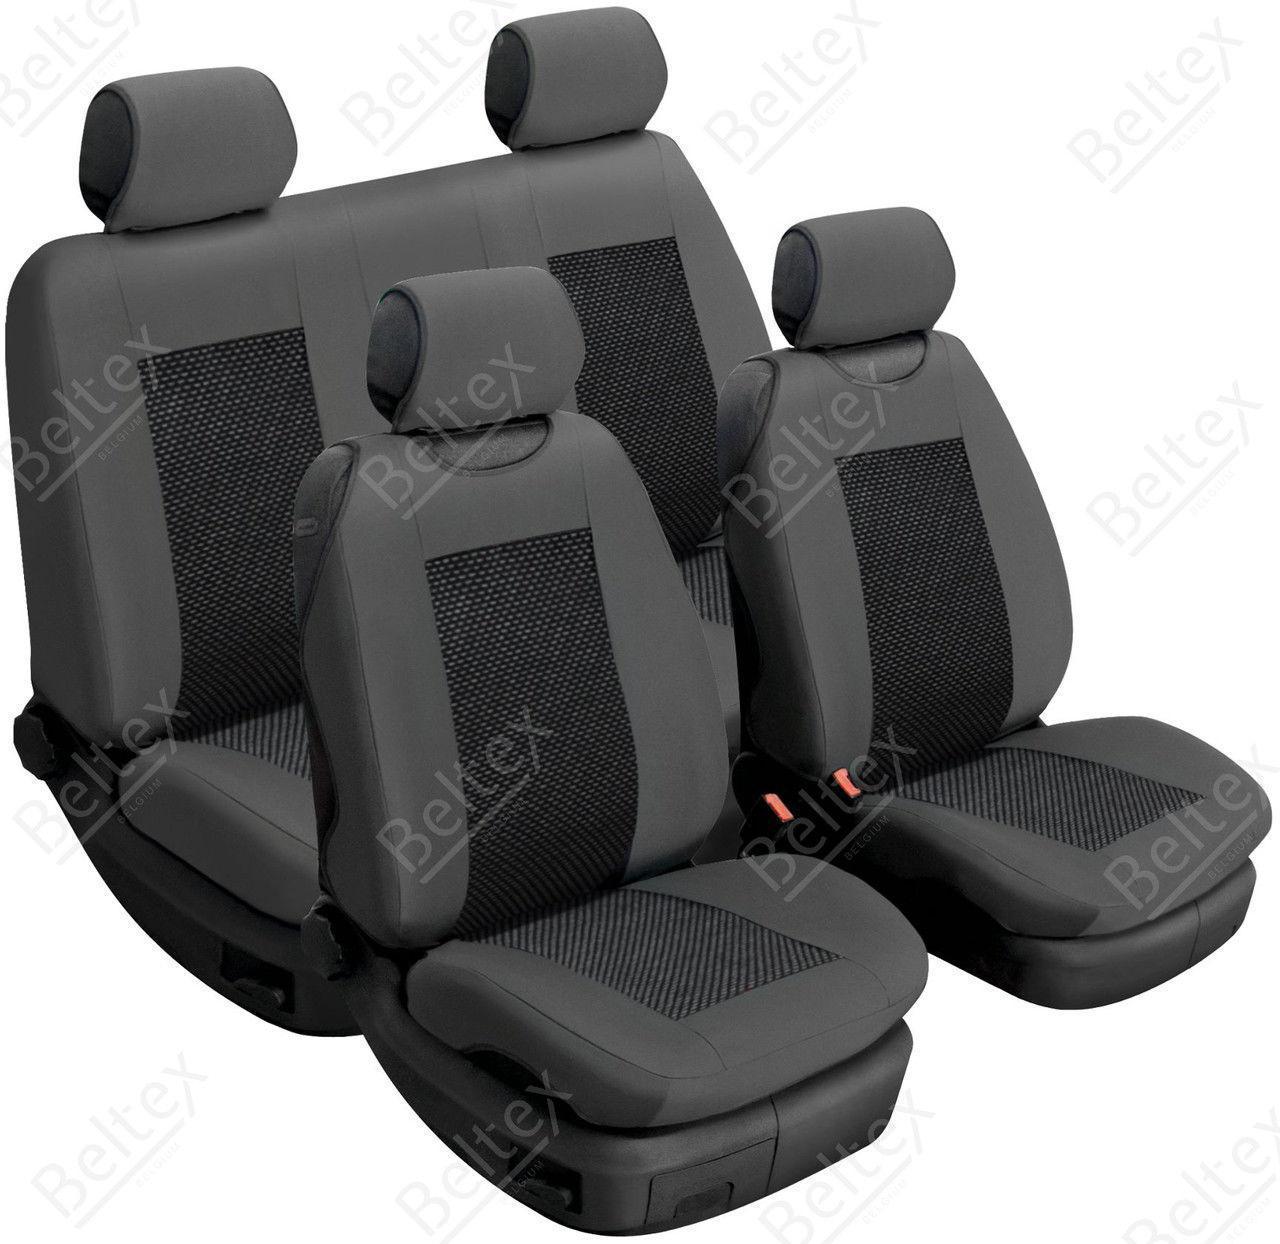 Майки/чехлы на сиденья Мазда 3 (Mazda 3)